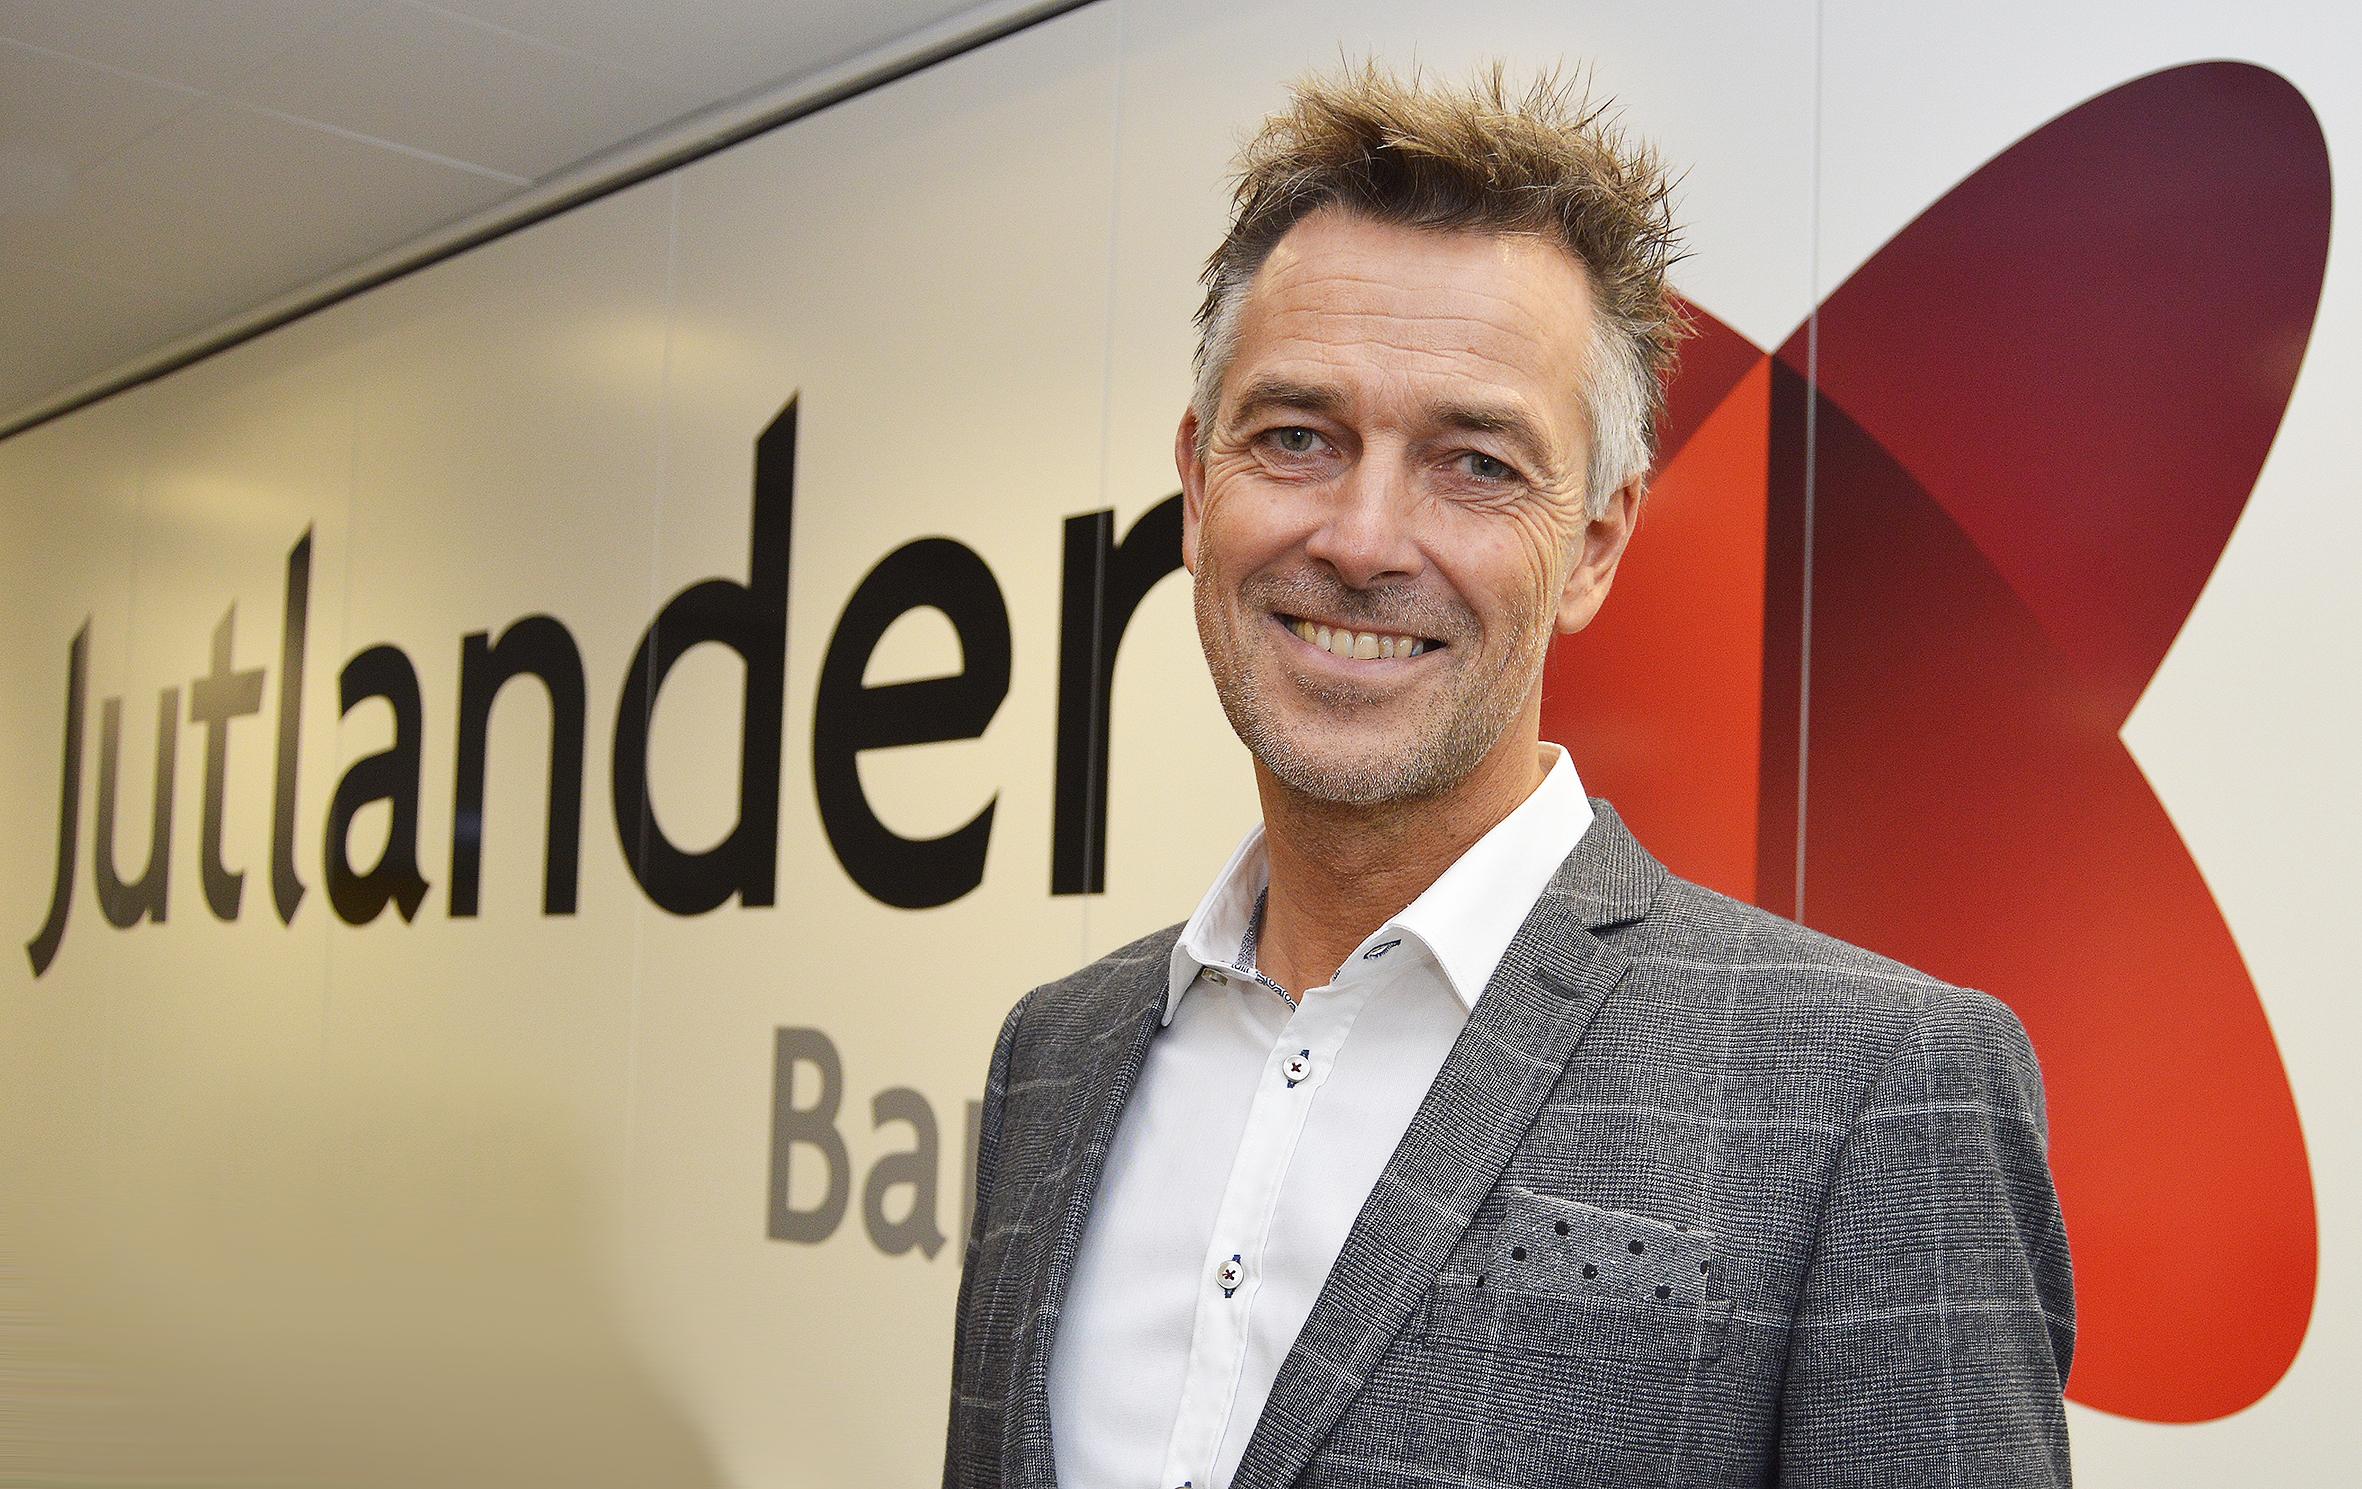 TIDLIGERE SPARNORD CHEF LØBER NY BANK I GANG I FREDERICIA